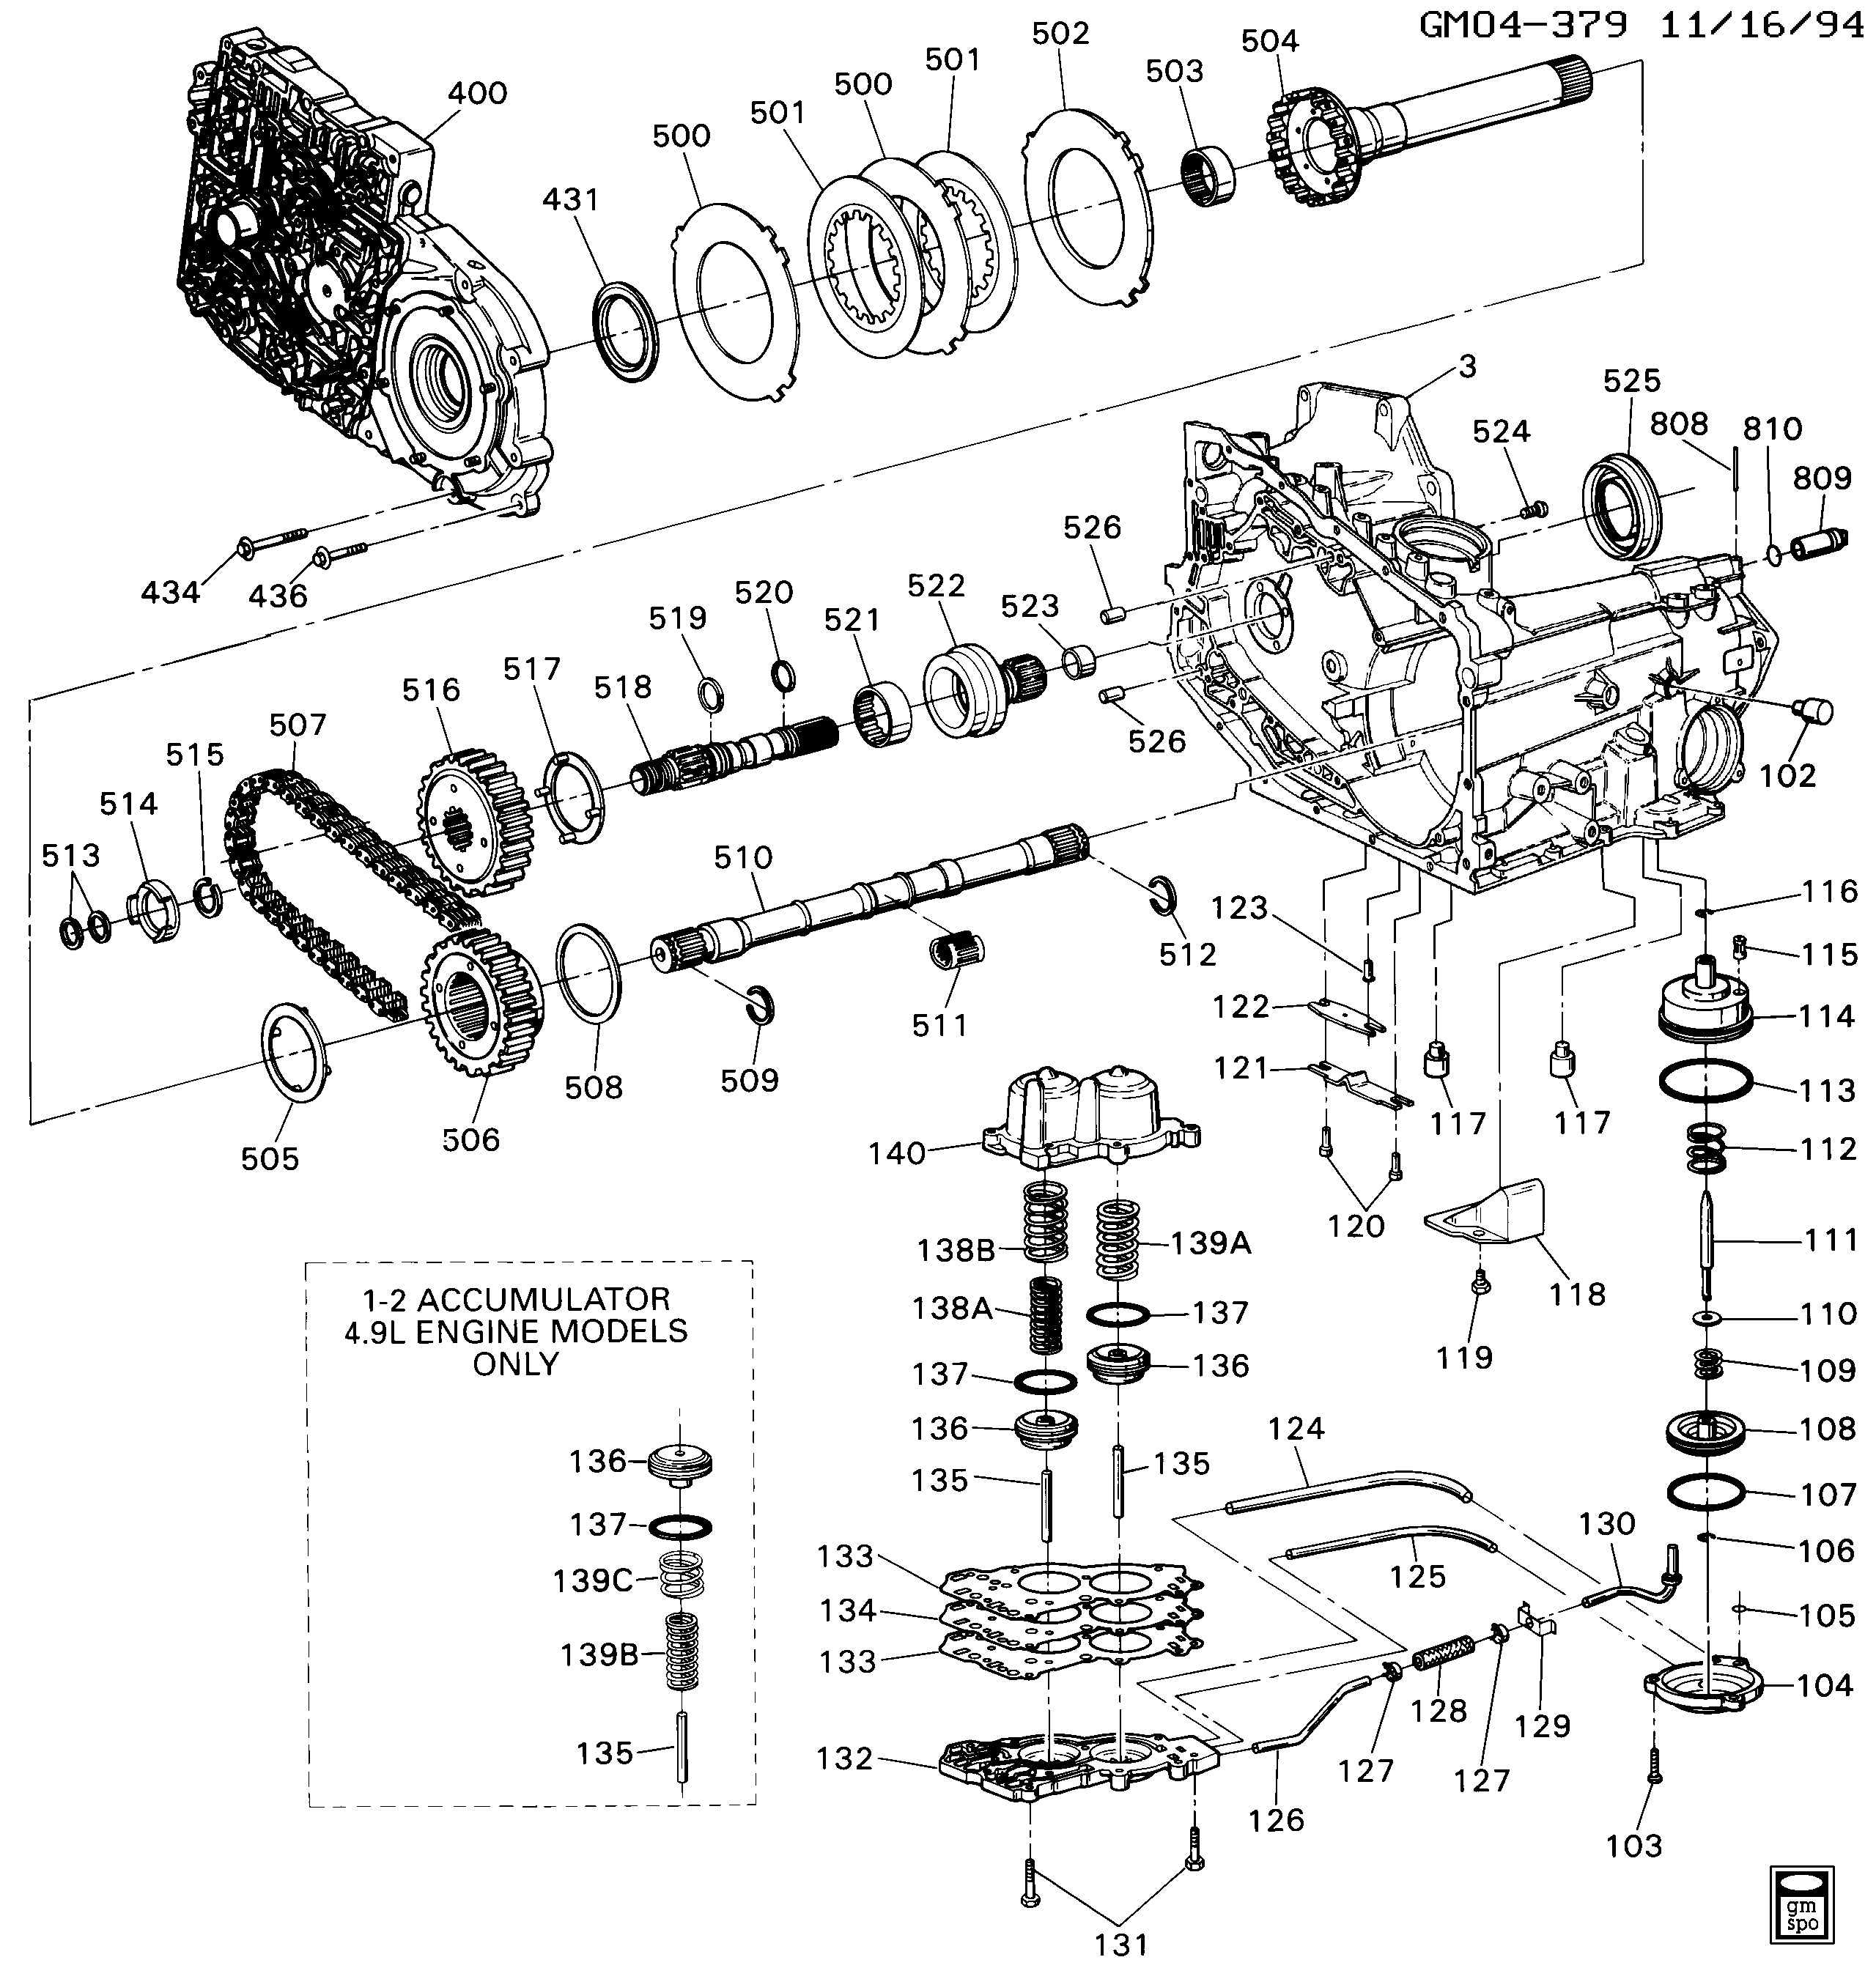 Gm Automatic Transmission Diagrams Lumina - Wiring Diagram series-design-a  - series-design-a.carmenpellegrinelli.it   Chevrolet Transmission Diagrams      carmenpellegrinelli.it